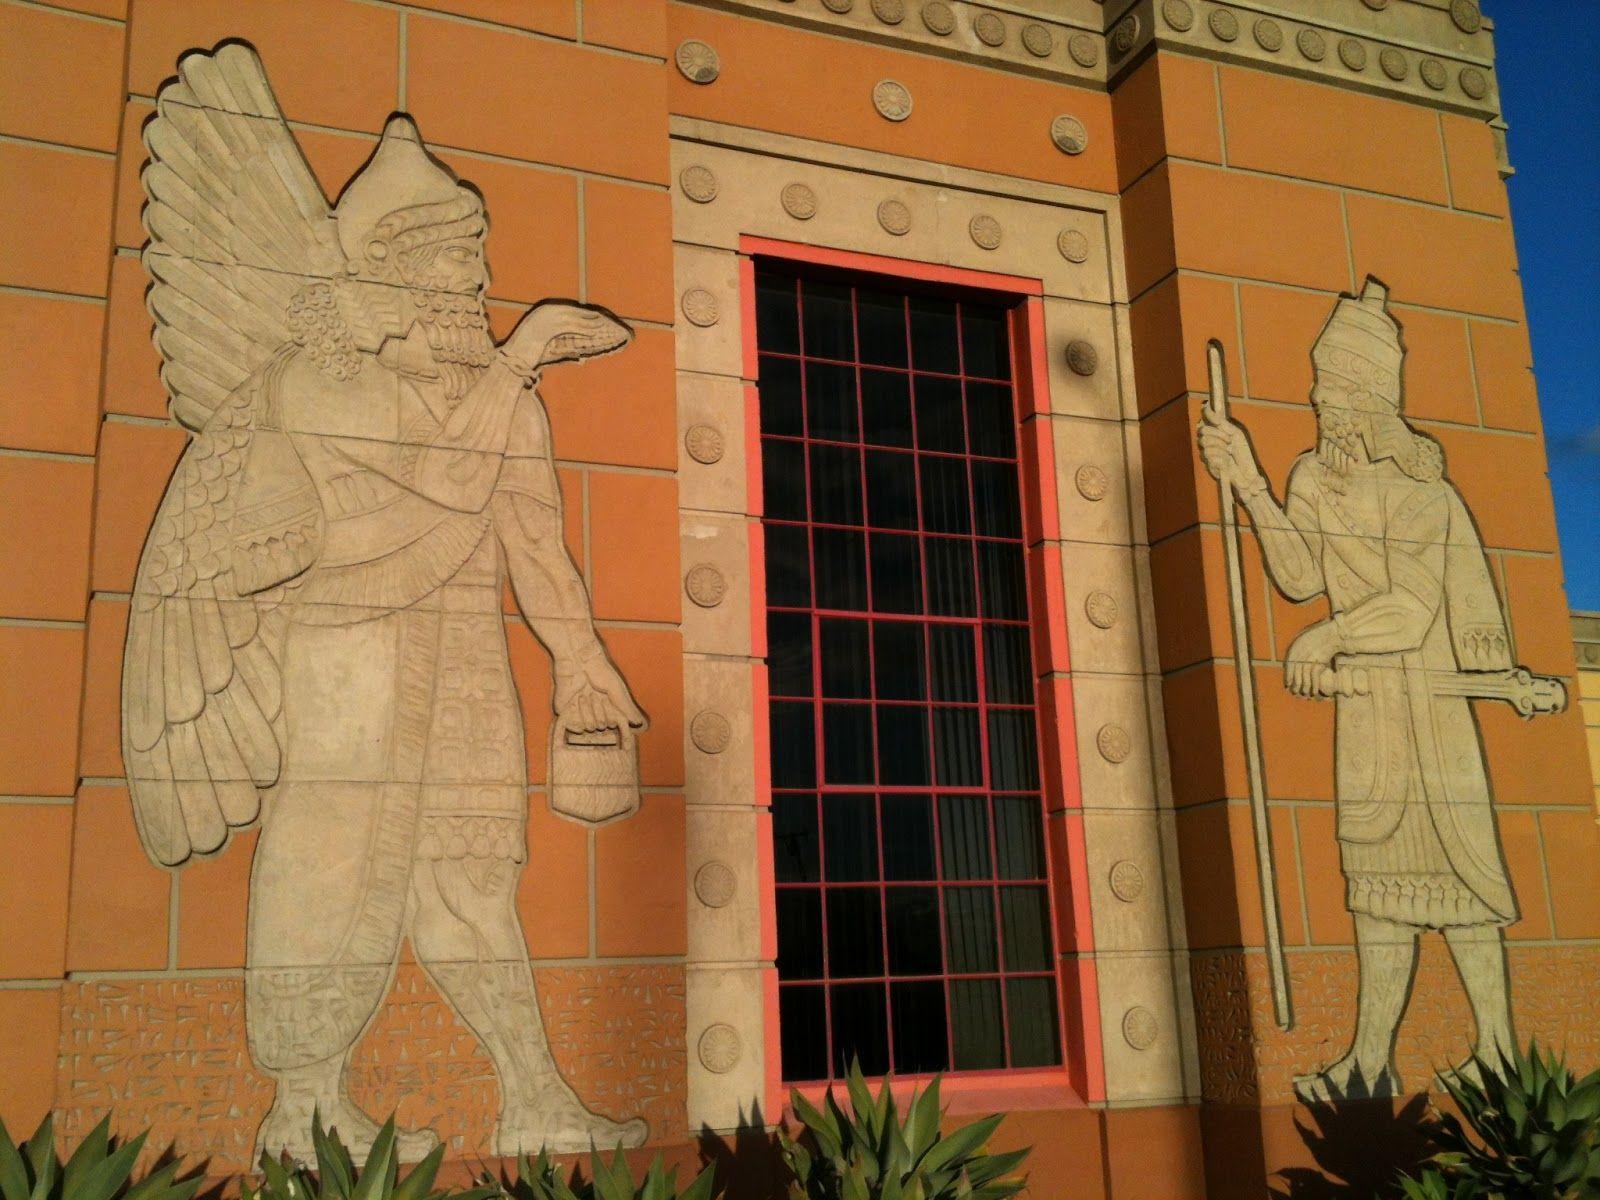 caterpillar shoes erbil citadel facade details 7